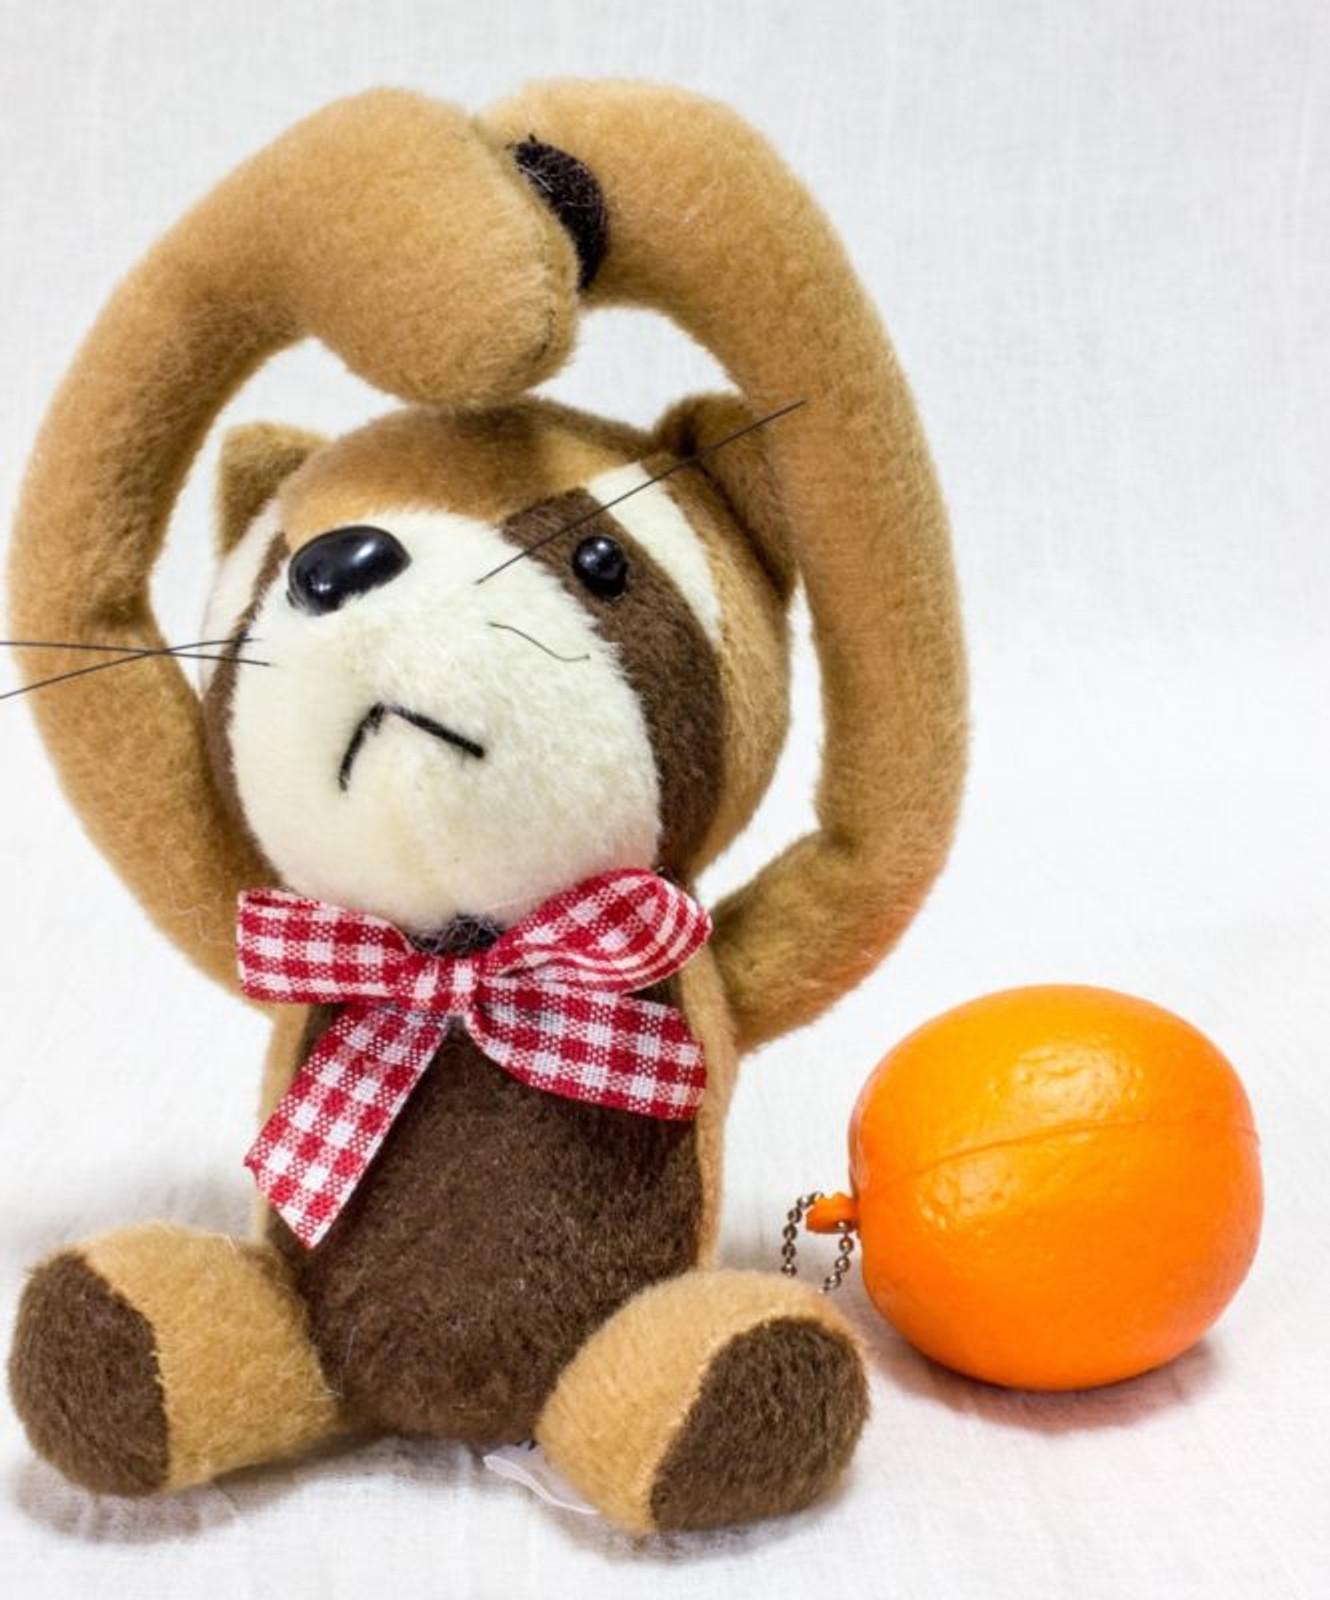 Raccoon Mascot Buzzer Plush Doll Figure JAPAN